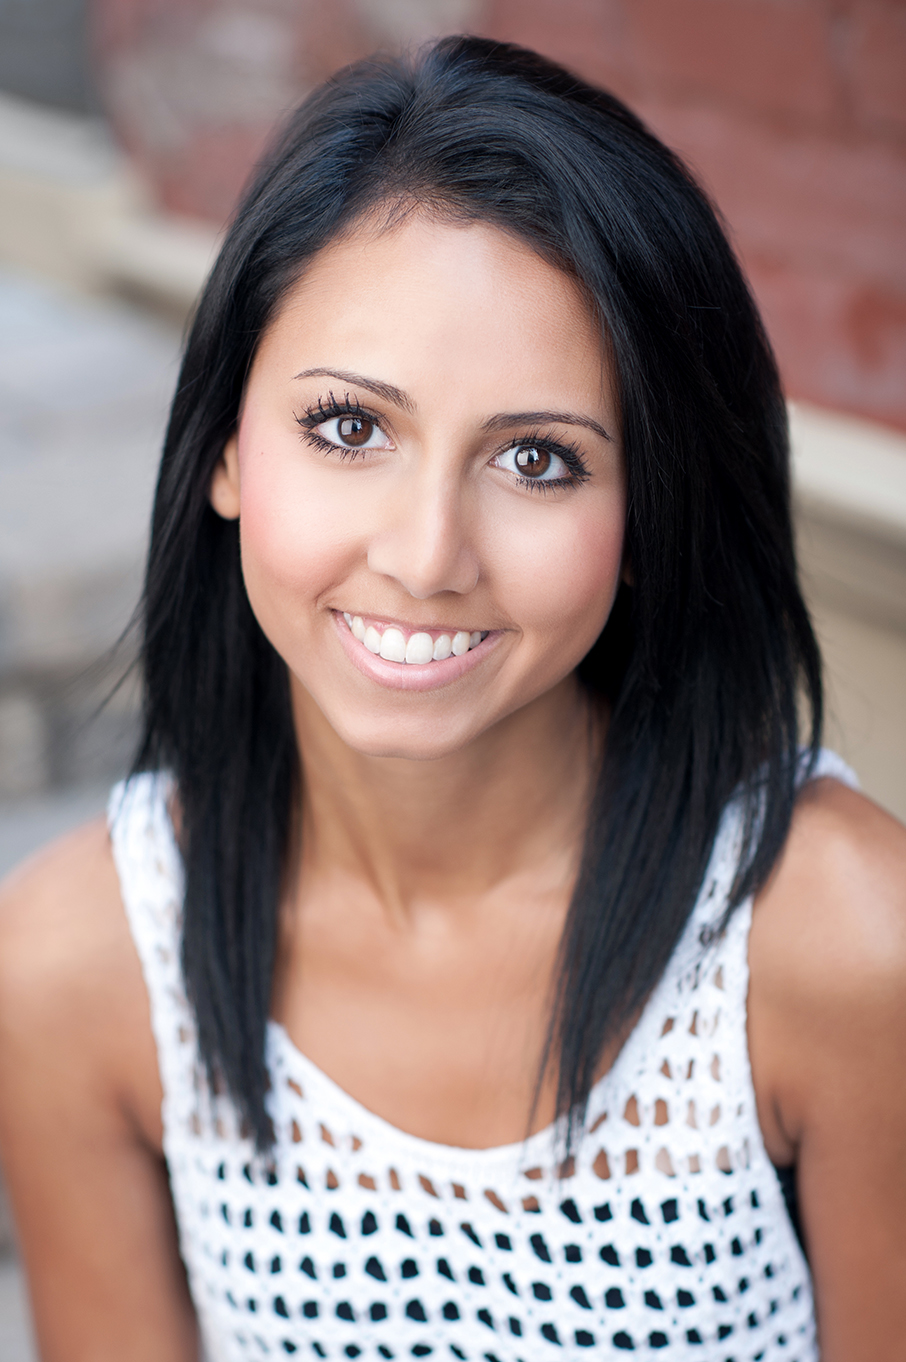 Lauren_Singh-1.jpg